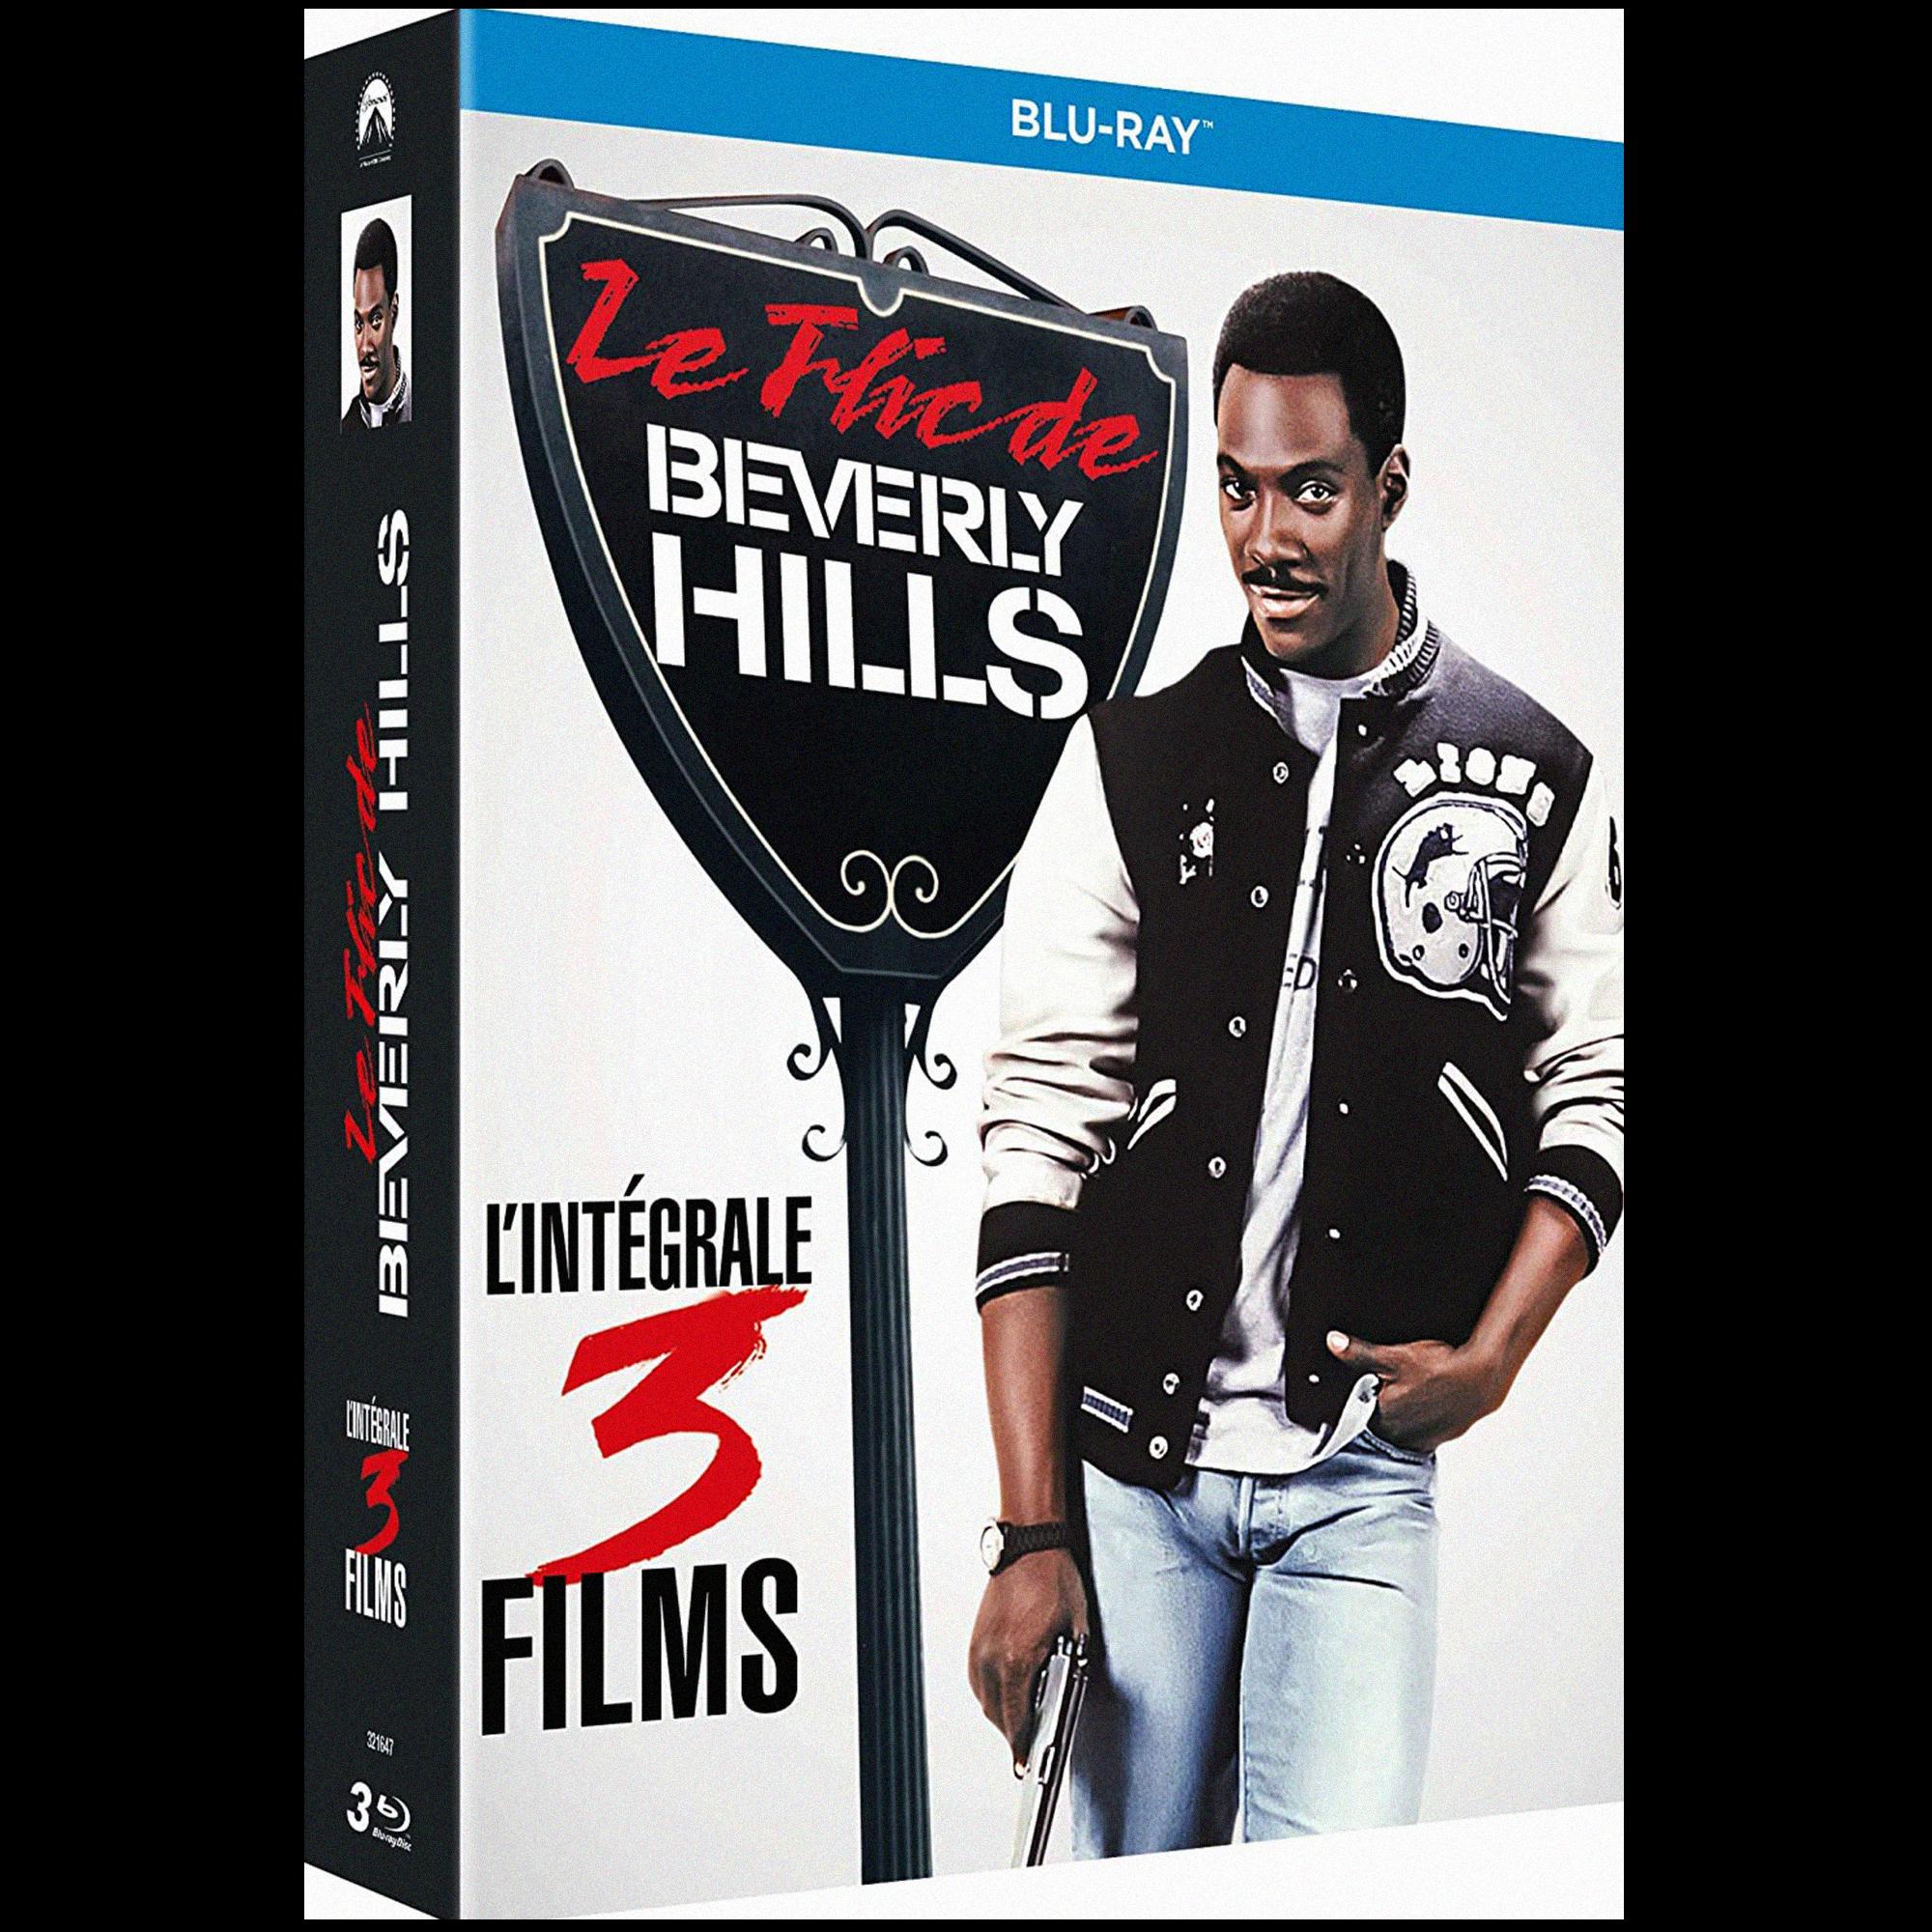 LE FLIC DE BEVERLY HILLS TRILOGIE - BRD